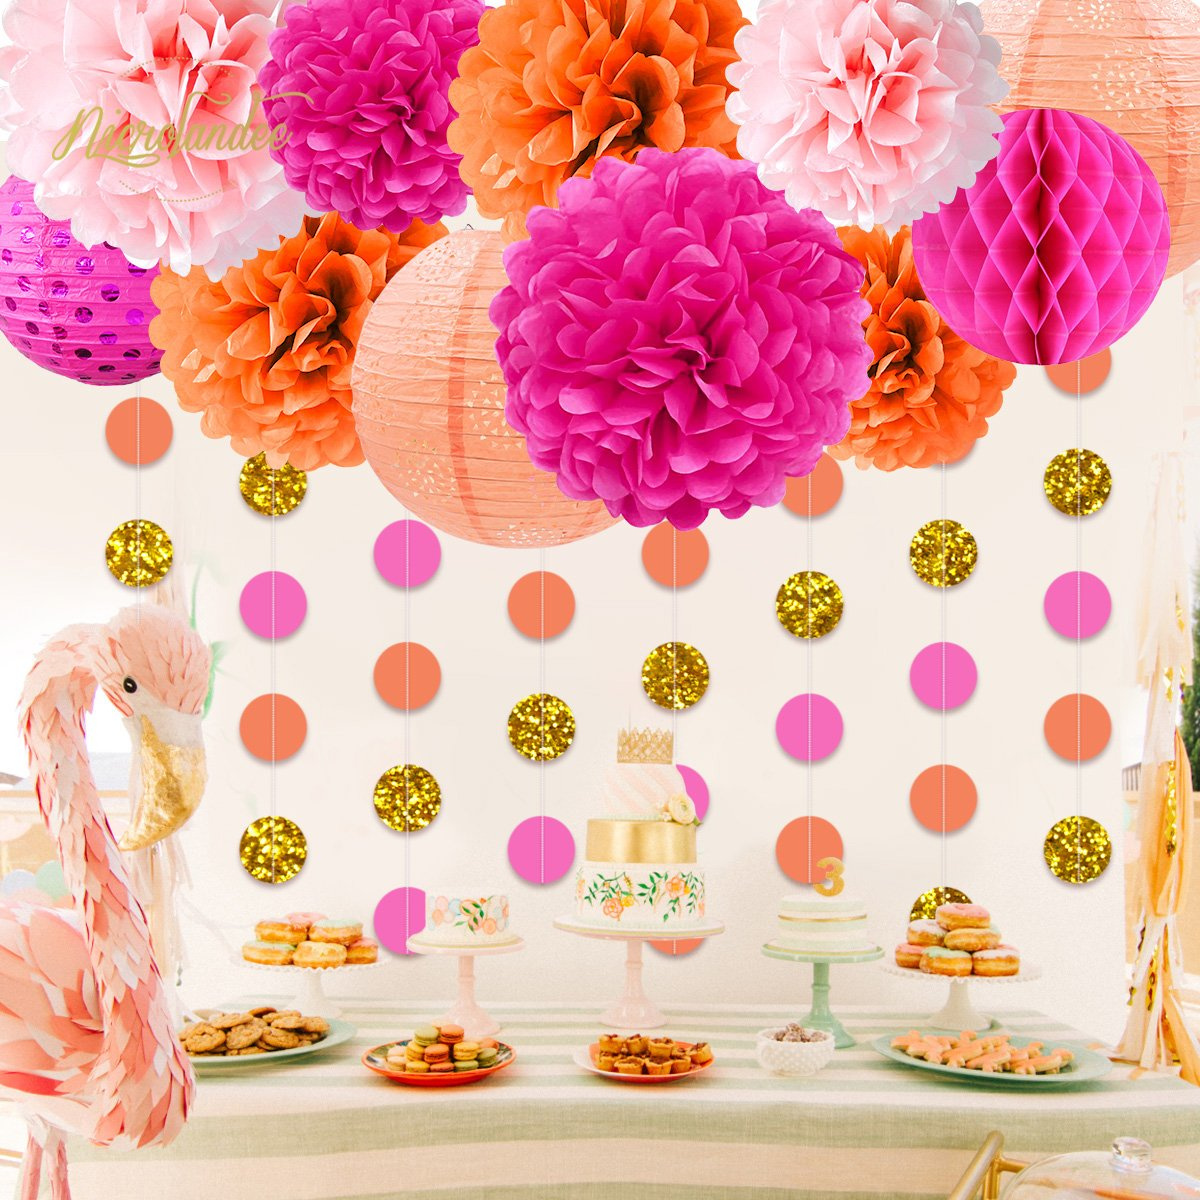 NICROLANDEE Pink and Orange Birthday Party Decoration Pack Paper Lanterns Tissue Flower Poms Gold Glitter Garland for Flamingo Bachelorette Birthday Baby Shower Thanksgiving Fiesta Festival Decor by NICROLANDEE (Image #3)